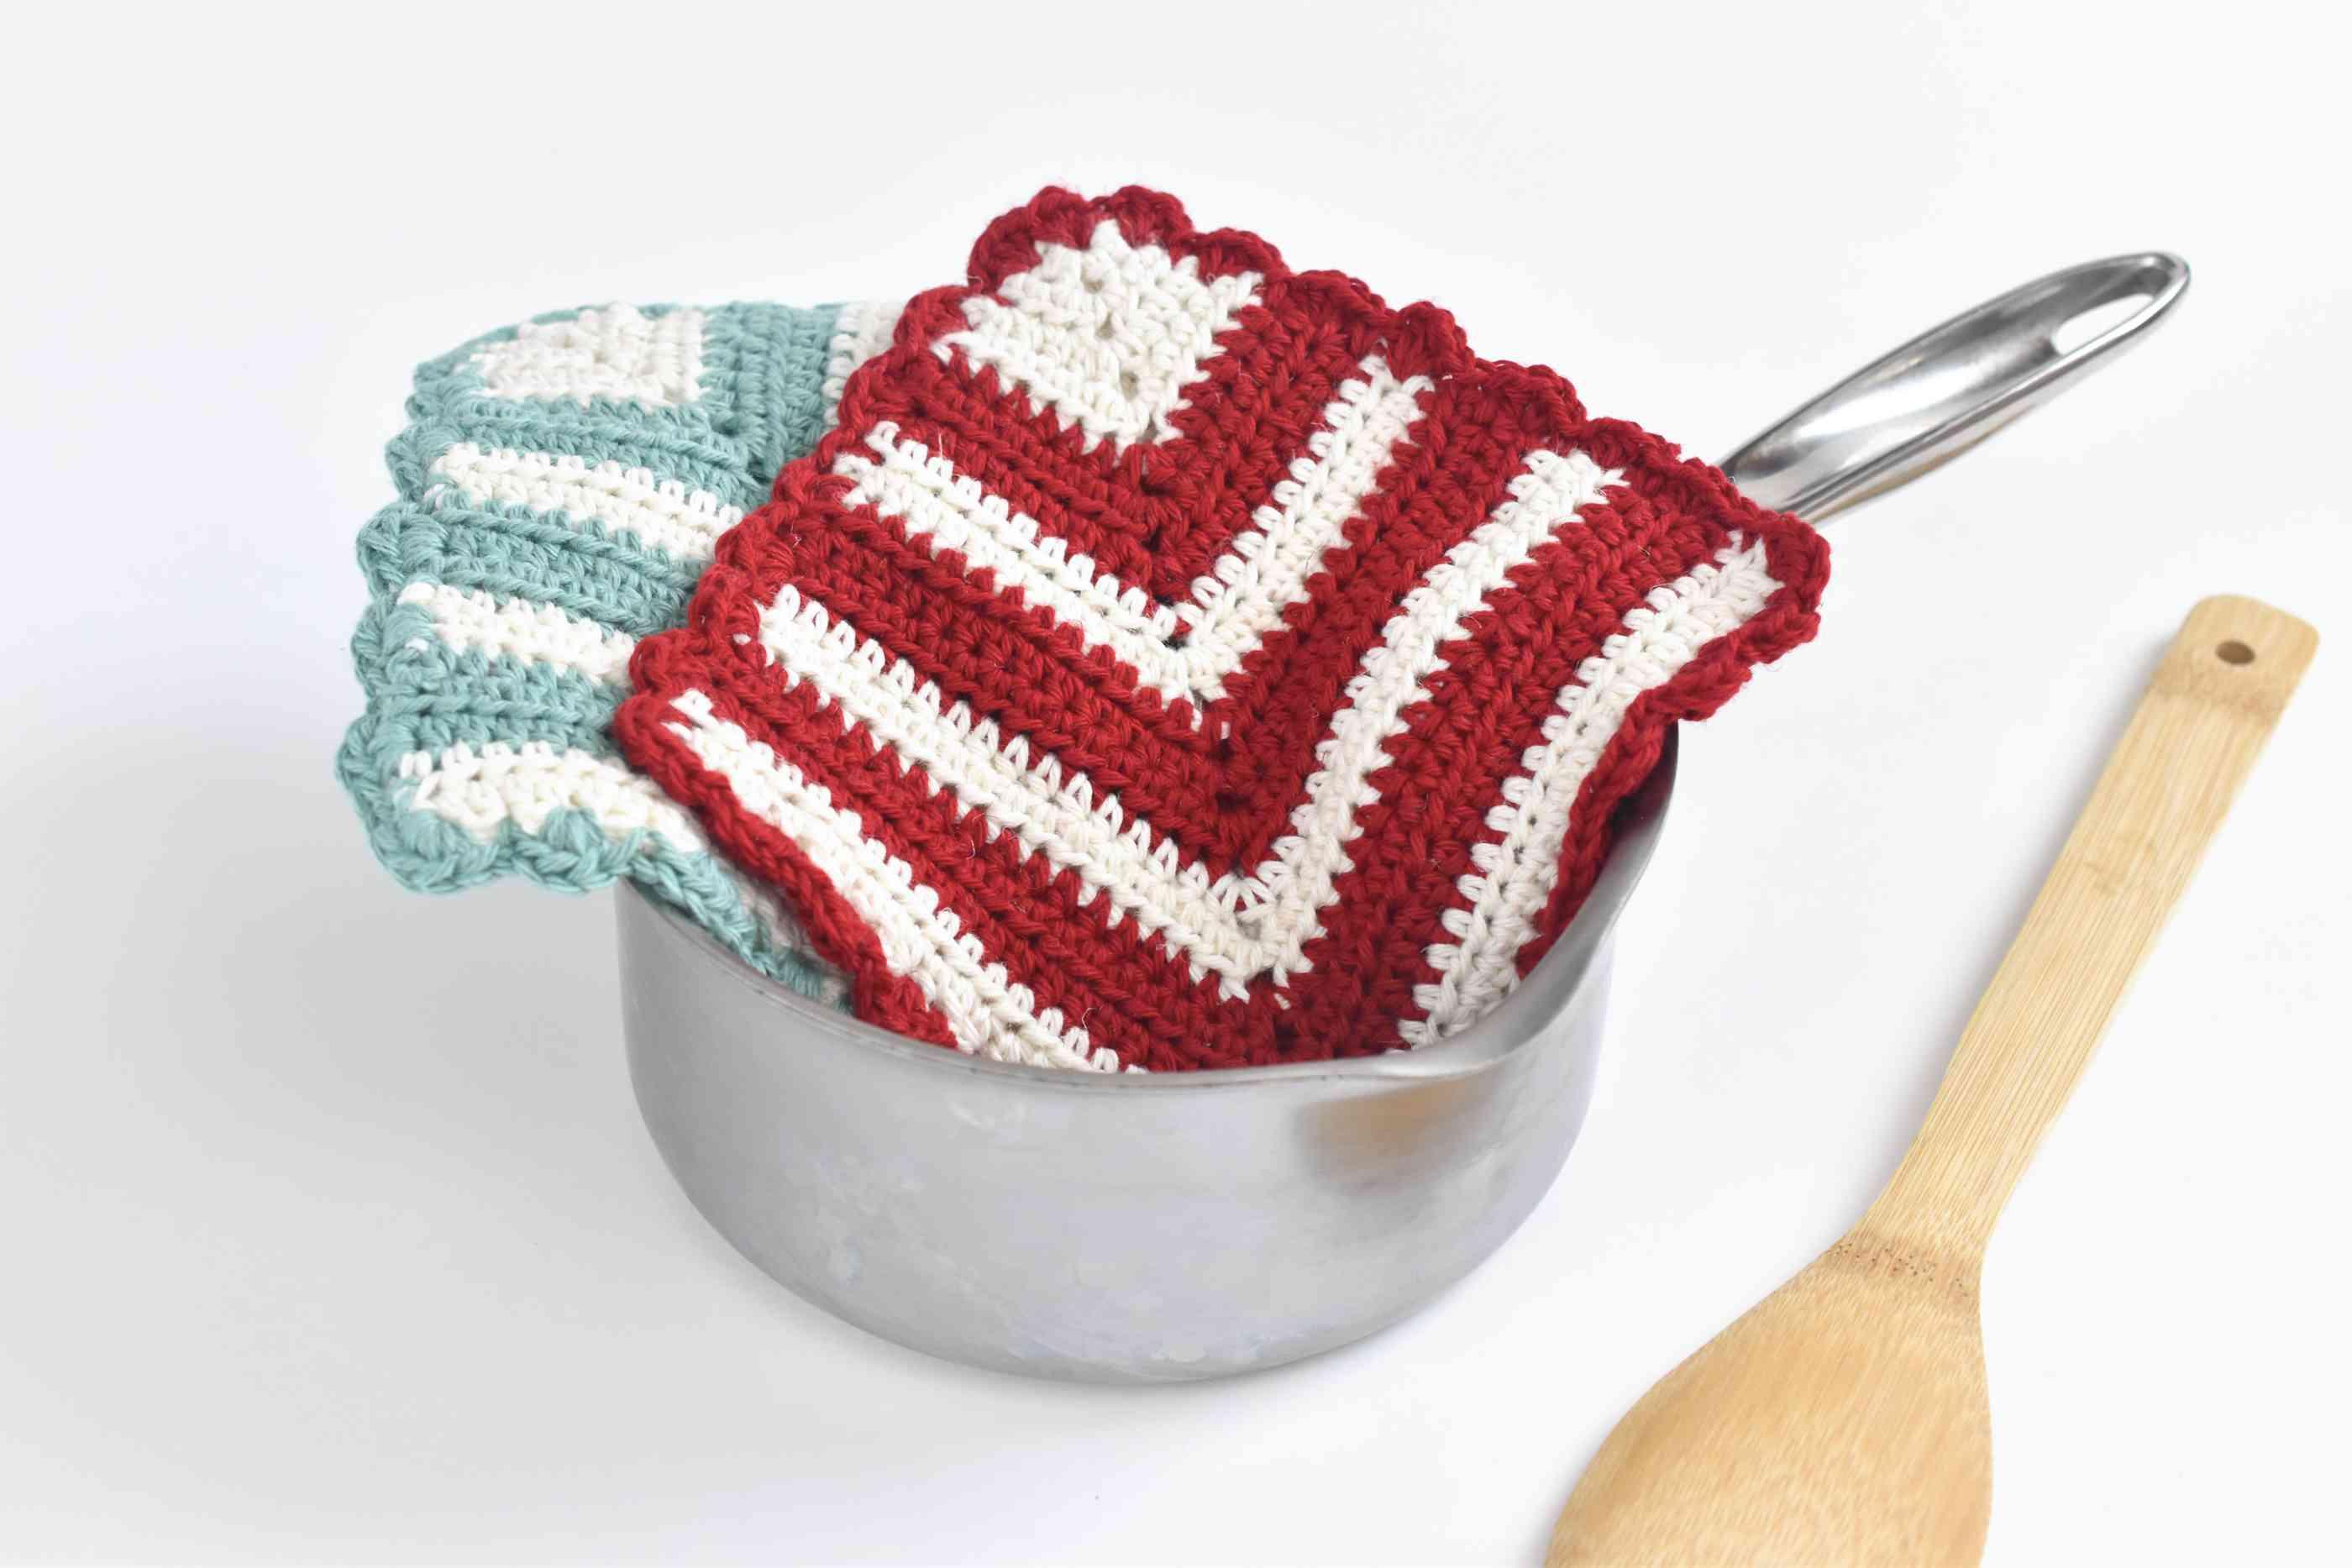 Vintage-Style Mitered Crochet Potholder